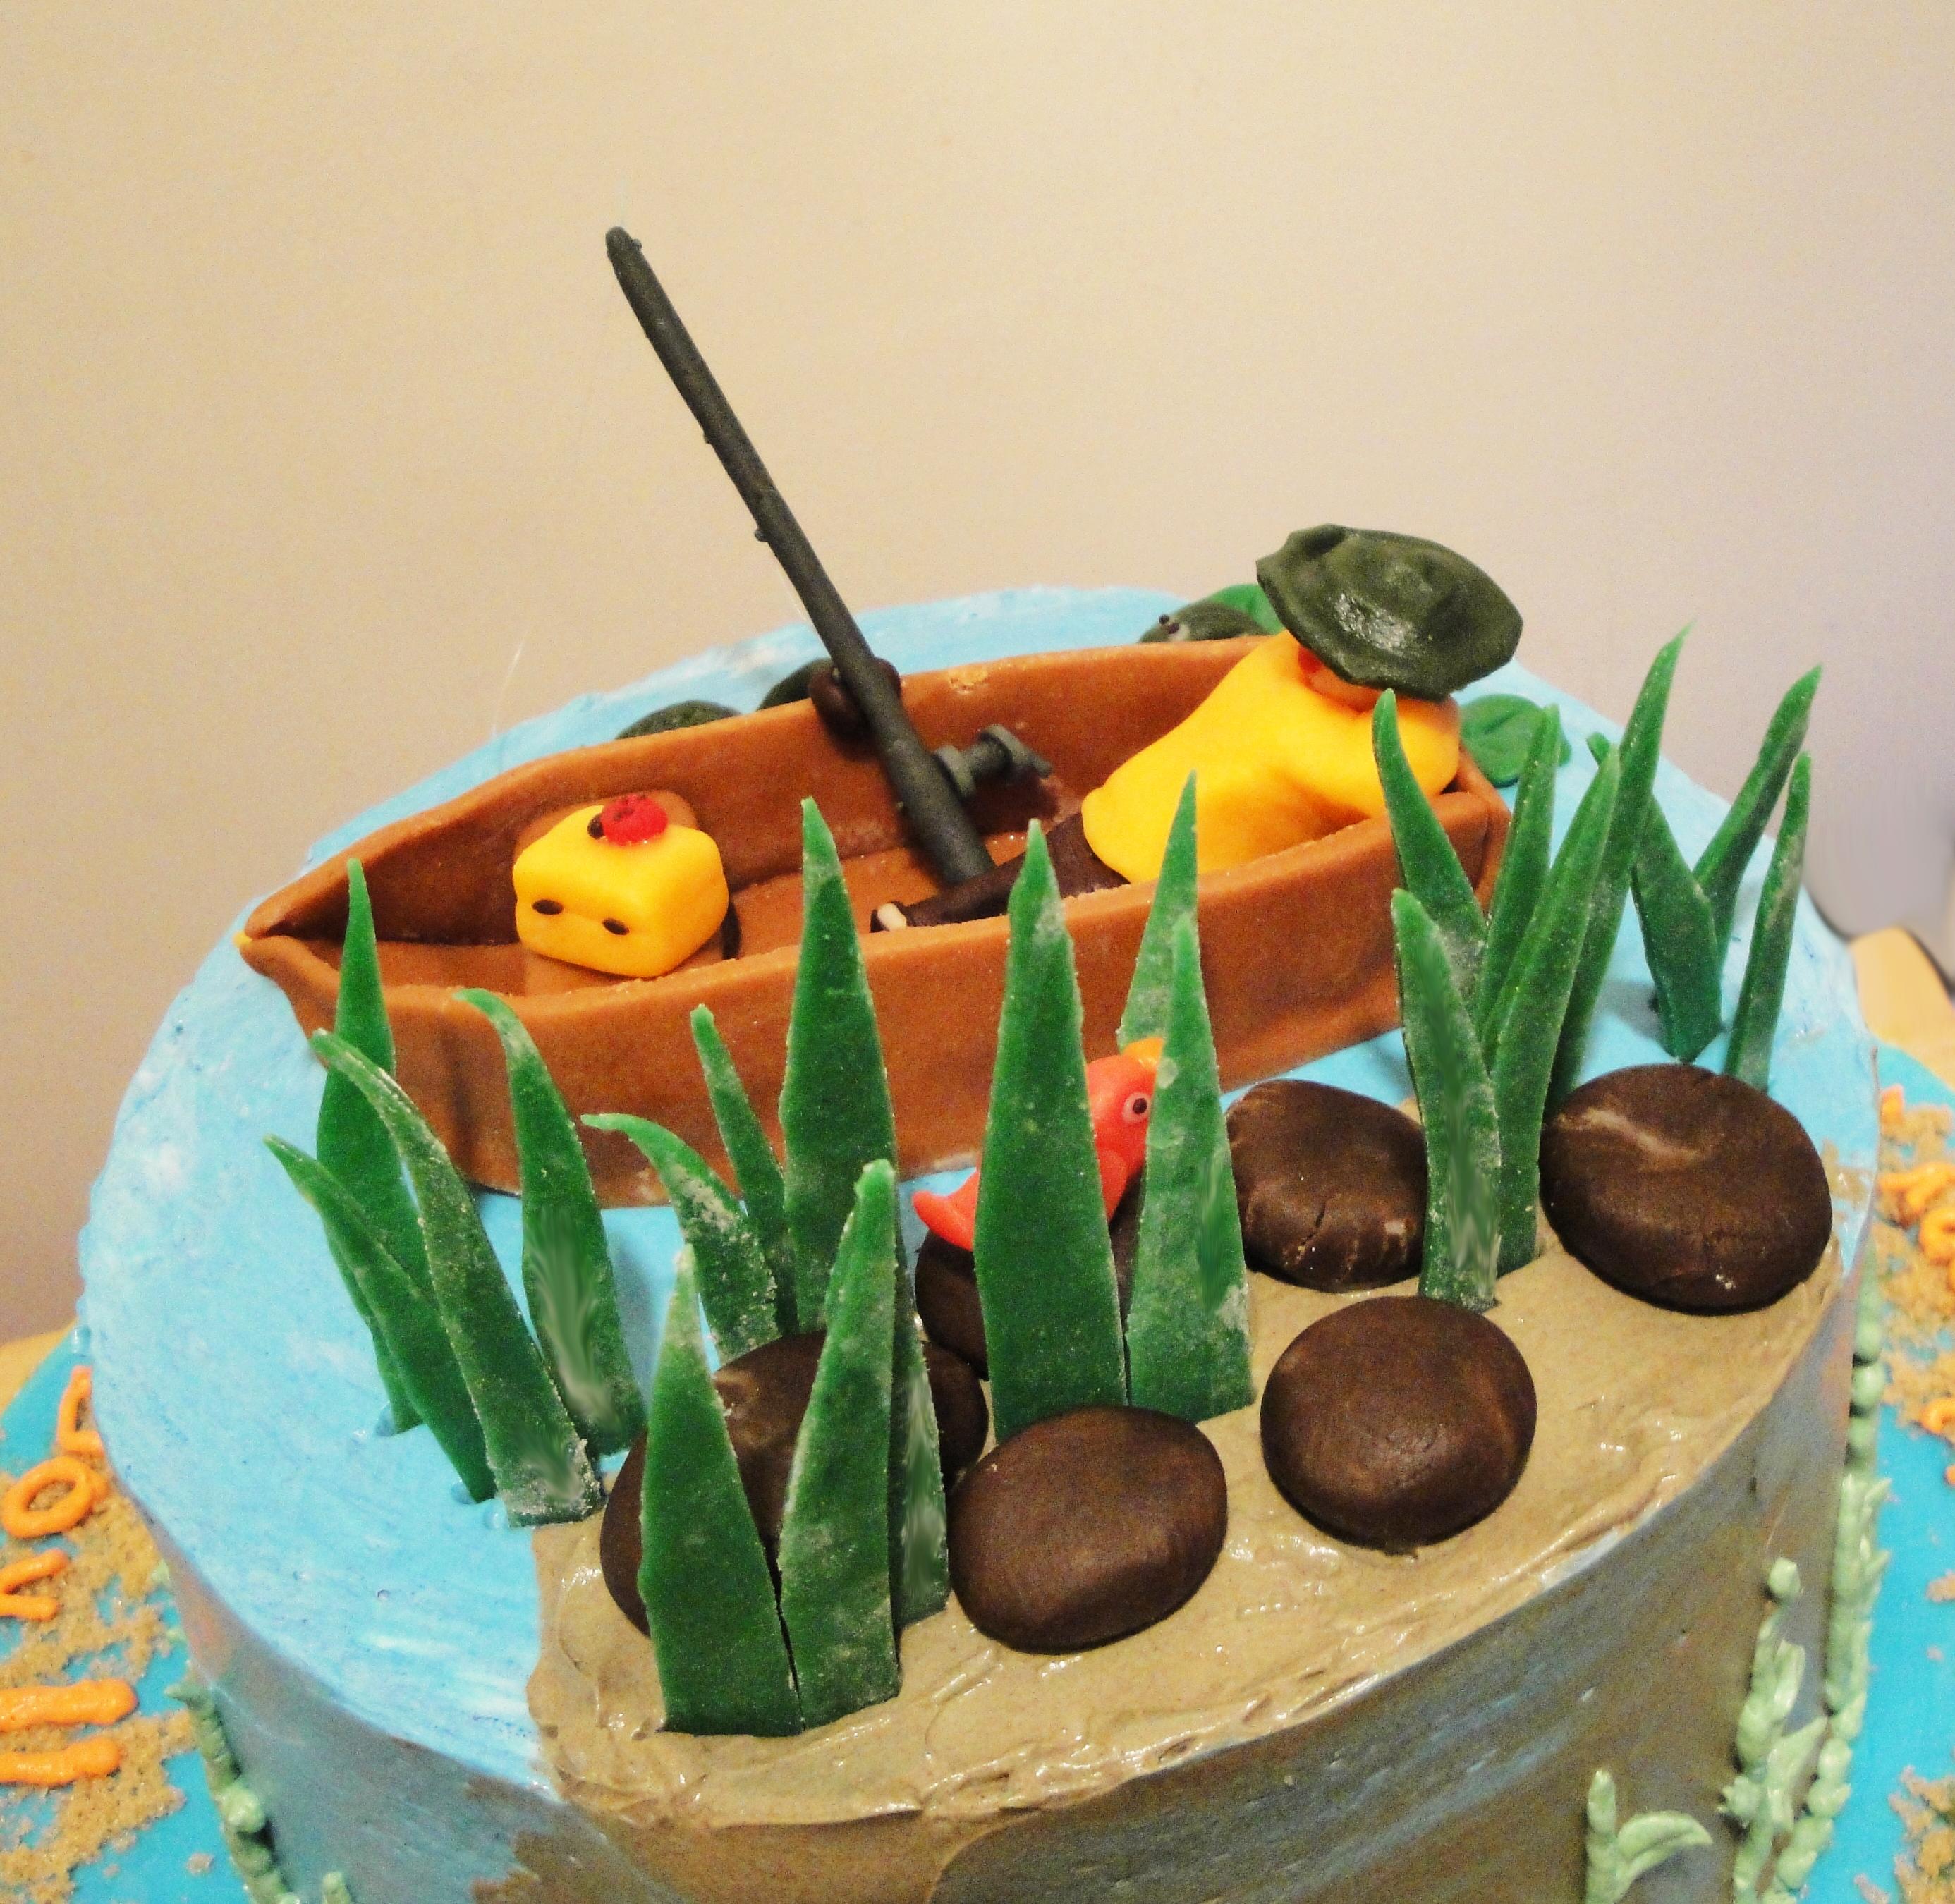 Incredible Gone Fishing Birthday Cake Twee Tea Licious Funny Birthday Cards Online Elaedamsfinfo